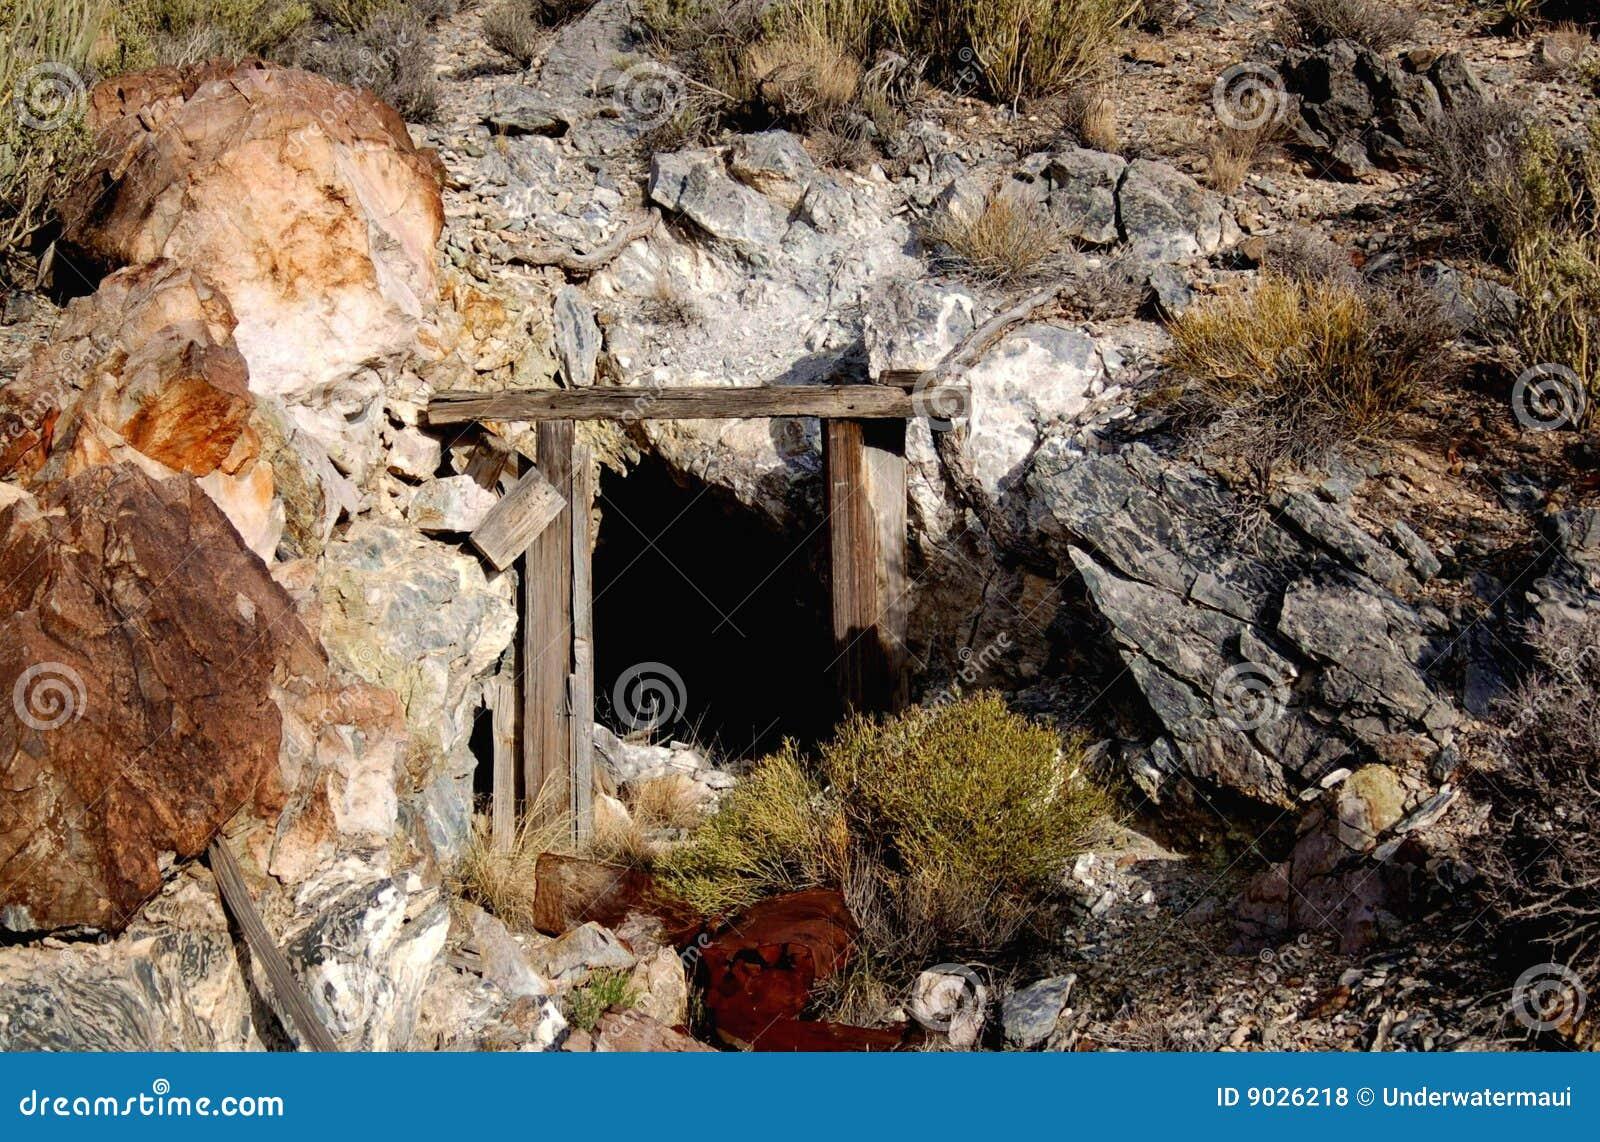 World Copper Mine stock photo  Image of hole, minerals - 9026218